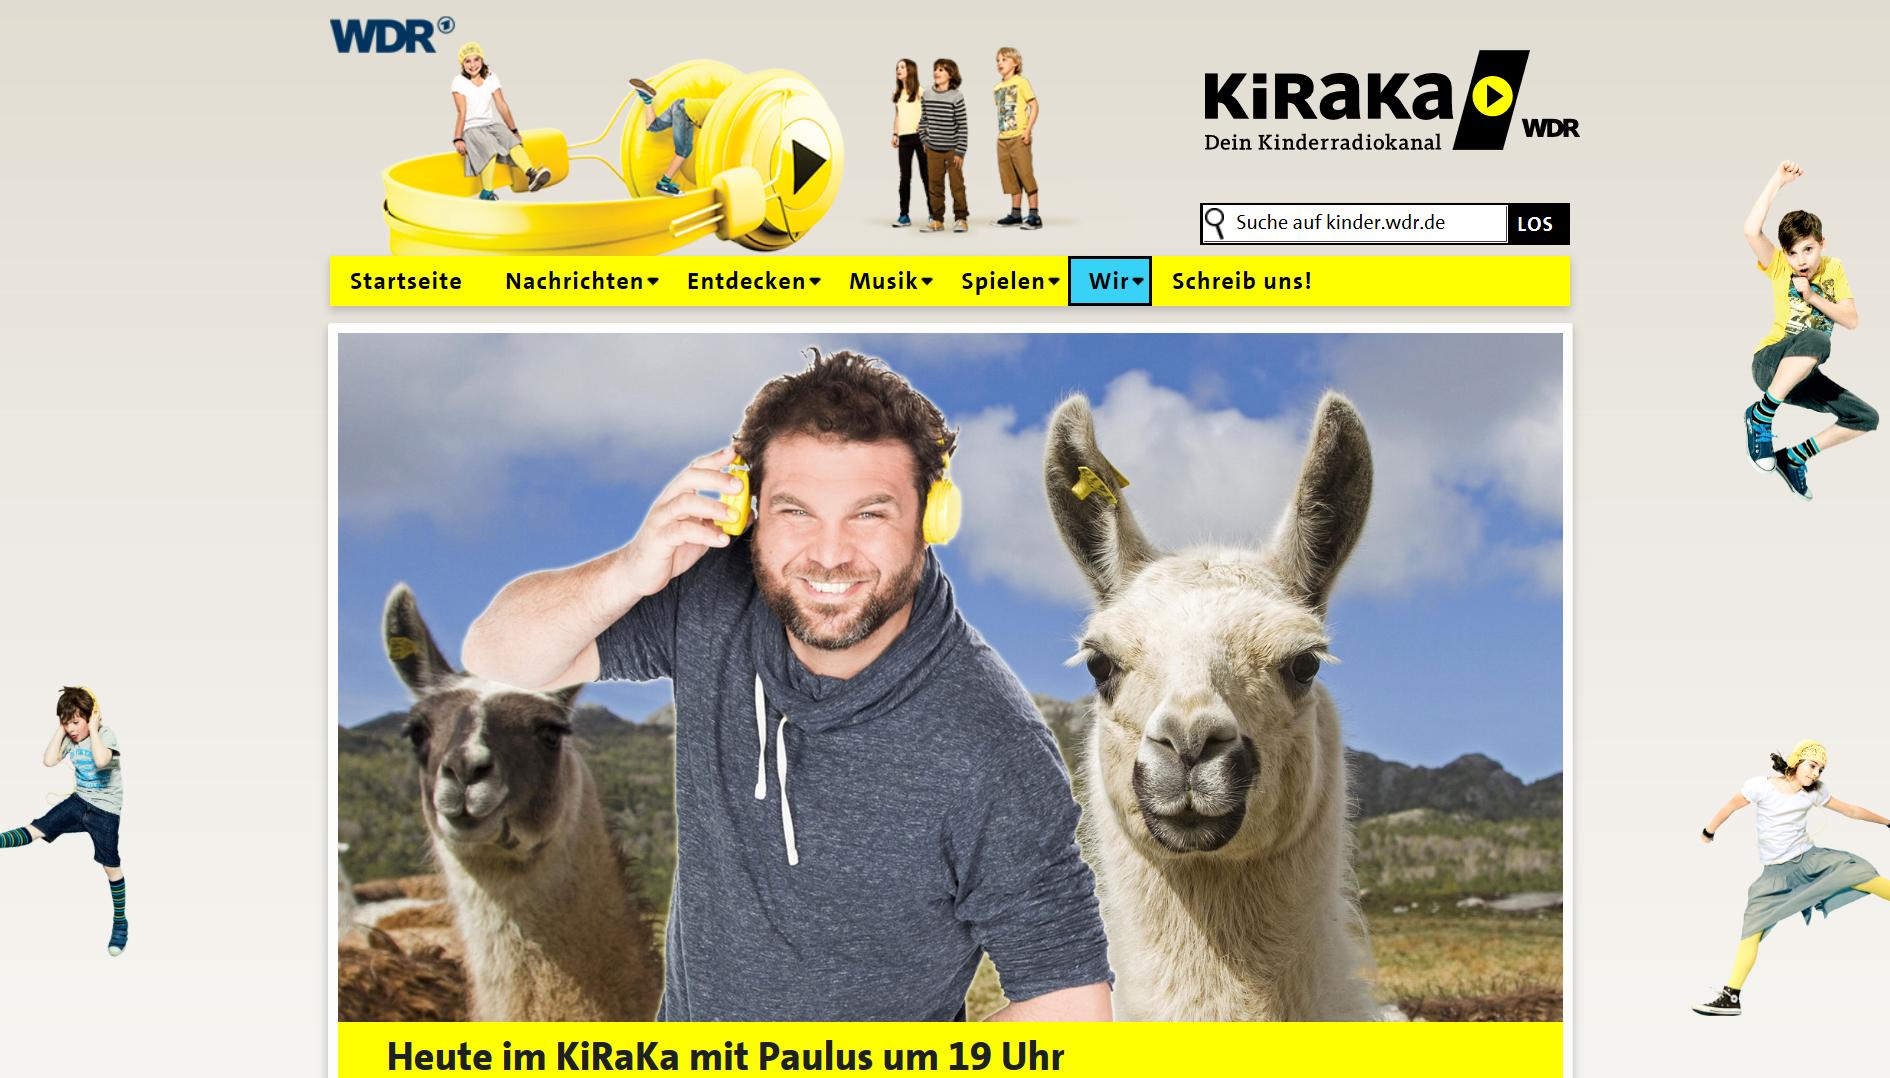 Wenn Kinder auf Lamas treffen - Radiobericht KiRaKa WDR 5 am 23 Januar 2020 Prachtlamas mit Andrea Eikelmann